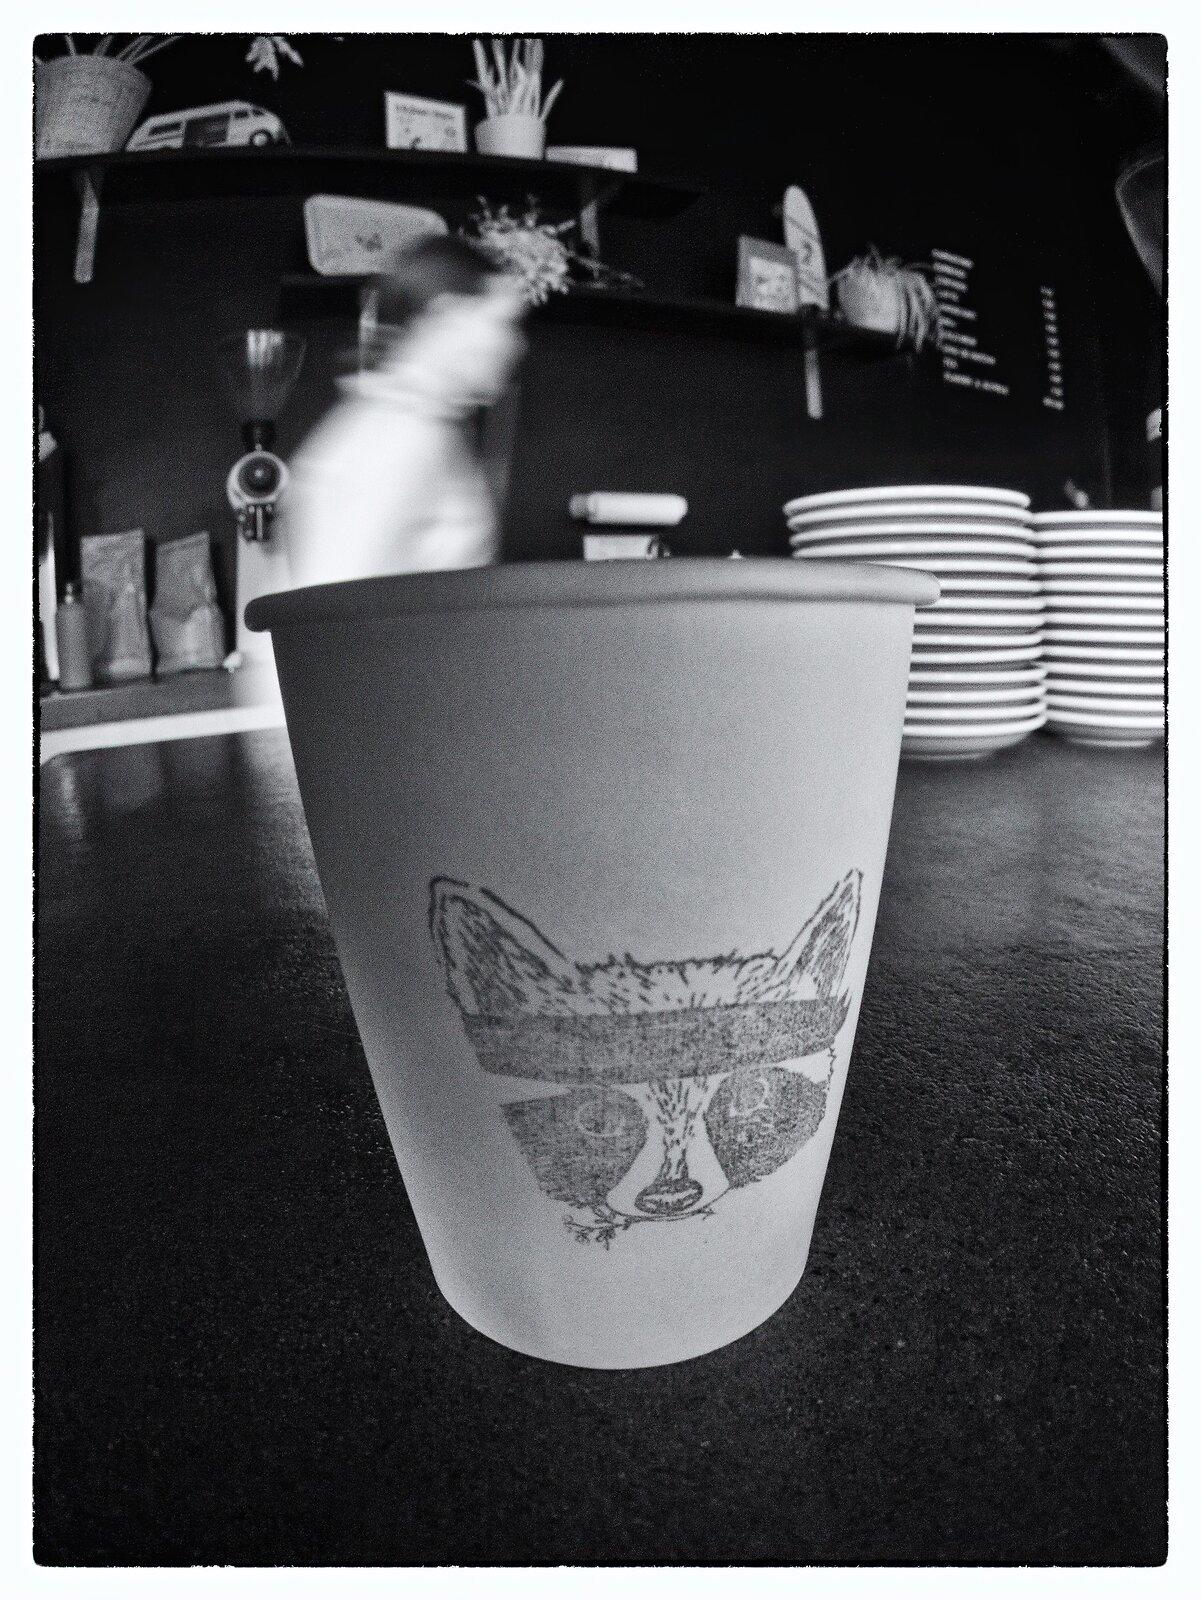 GX1_Feb22_21_raccoon_cappuccino.jpg